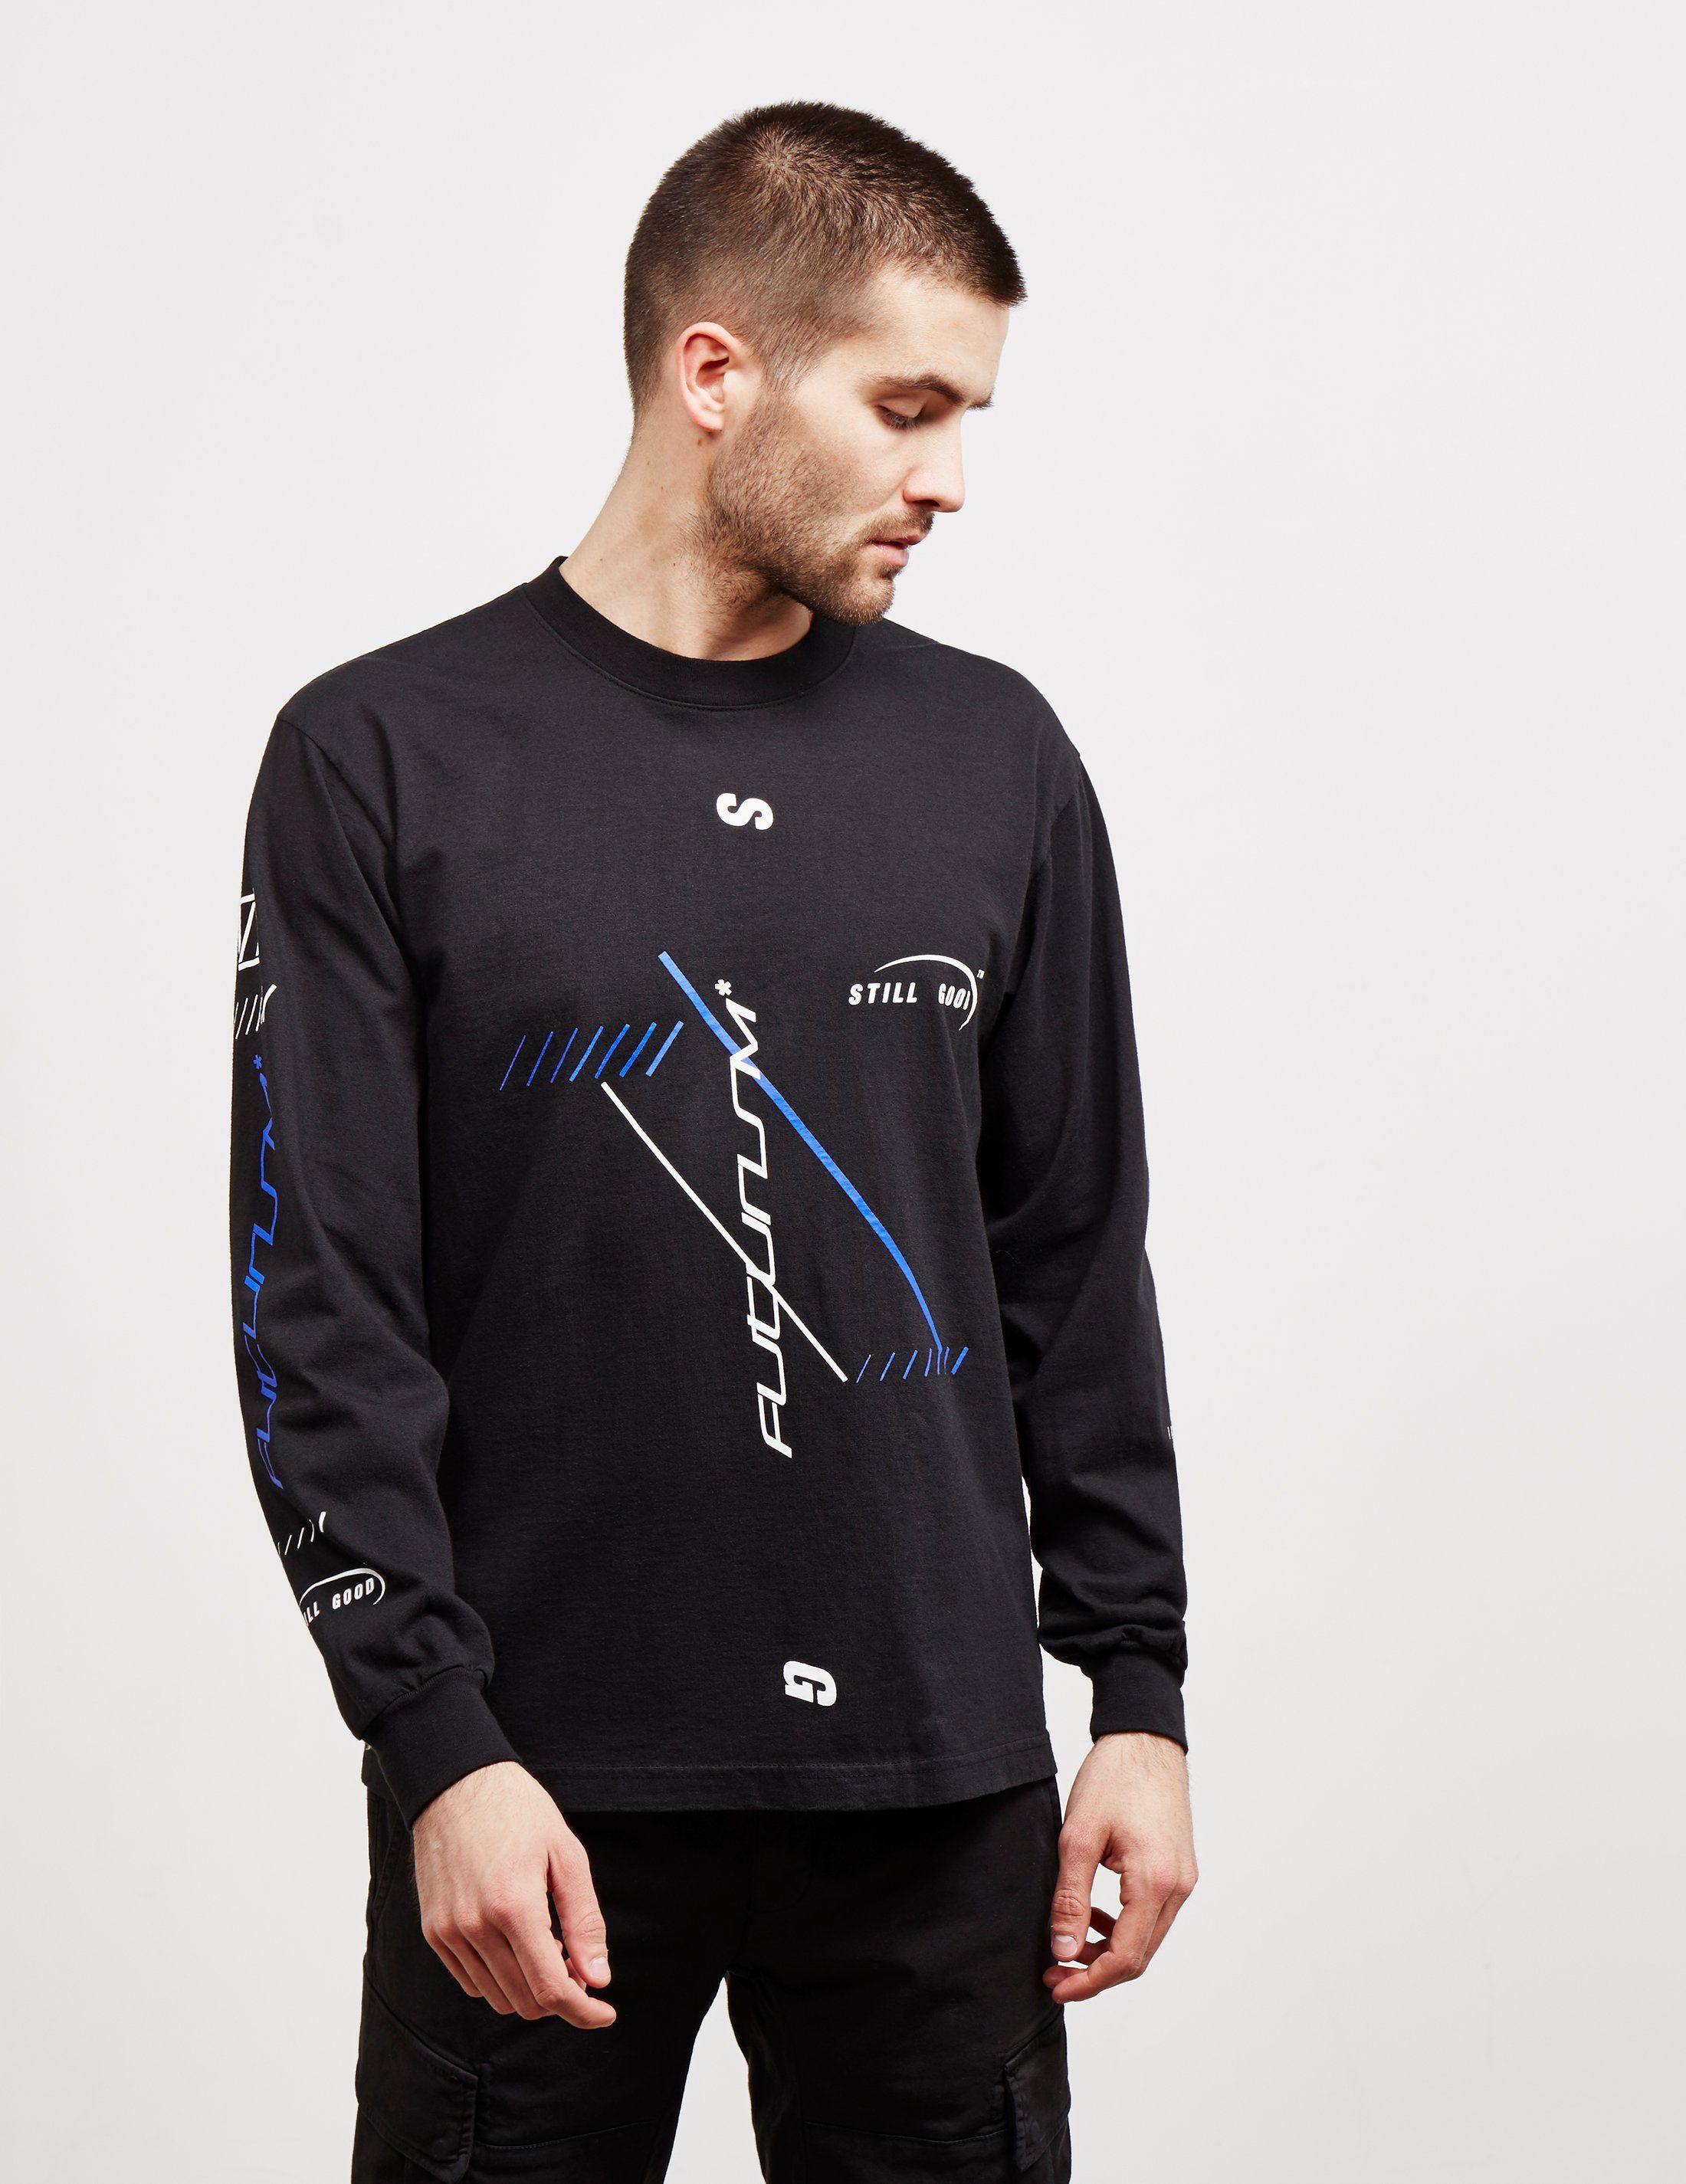 Still Good Rayonism Long Sleeve T-Shirt